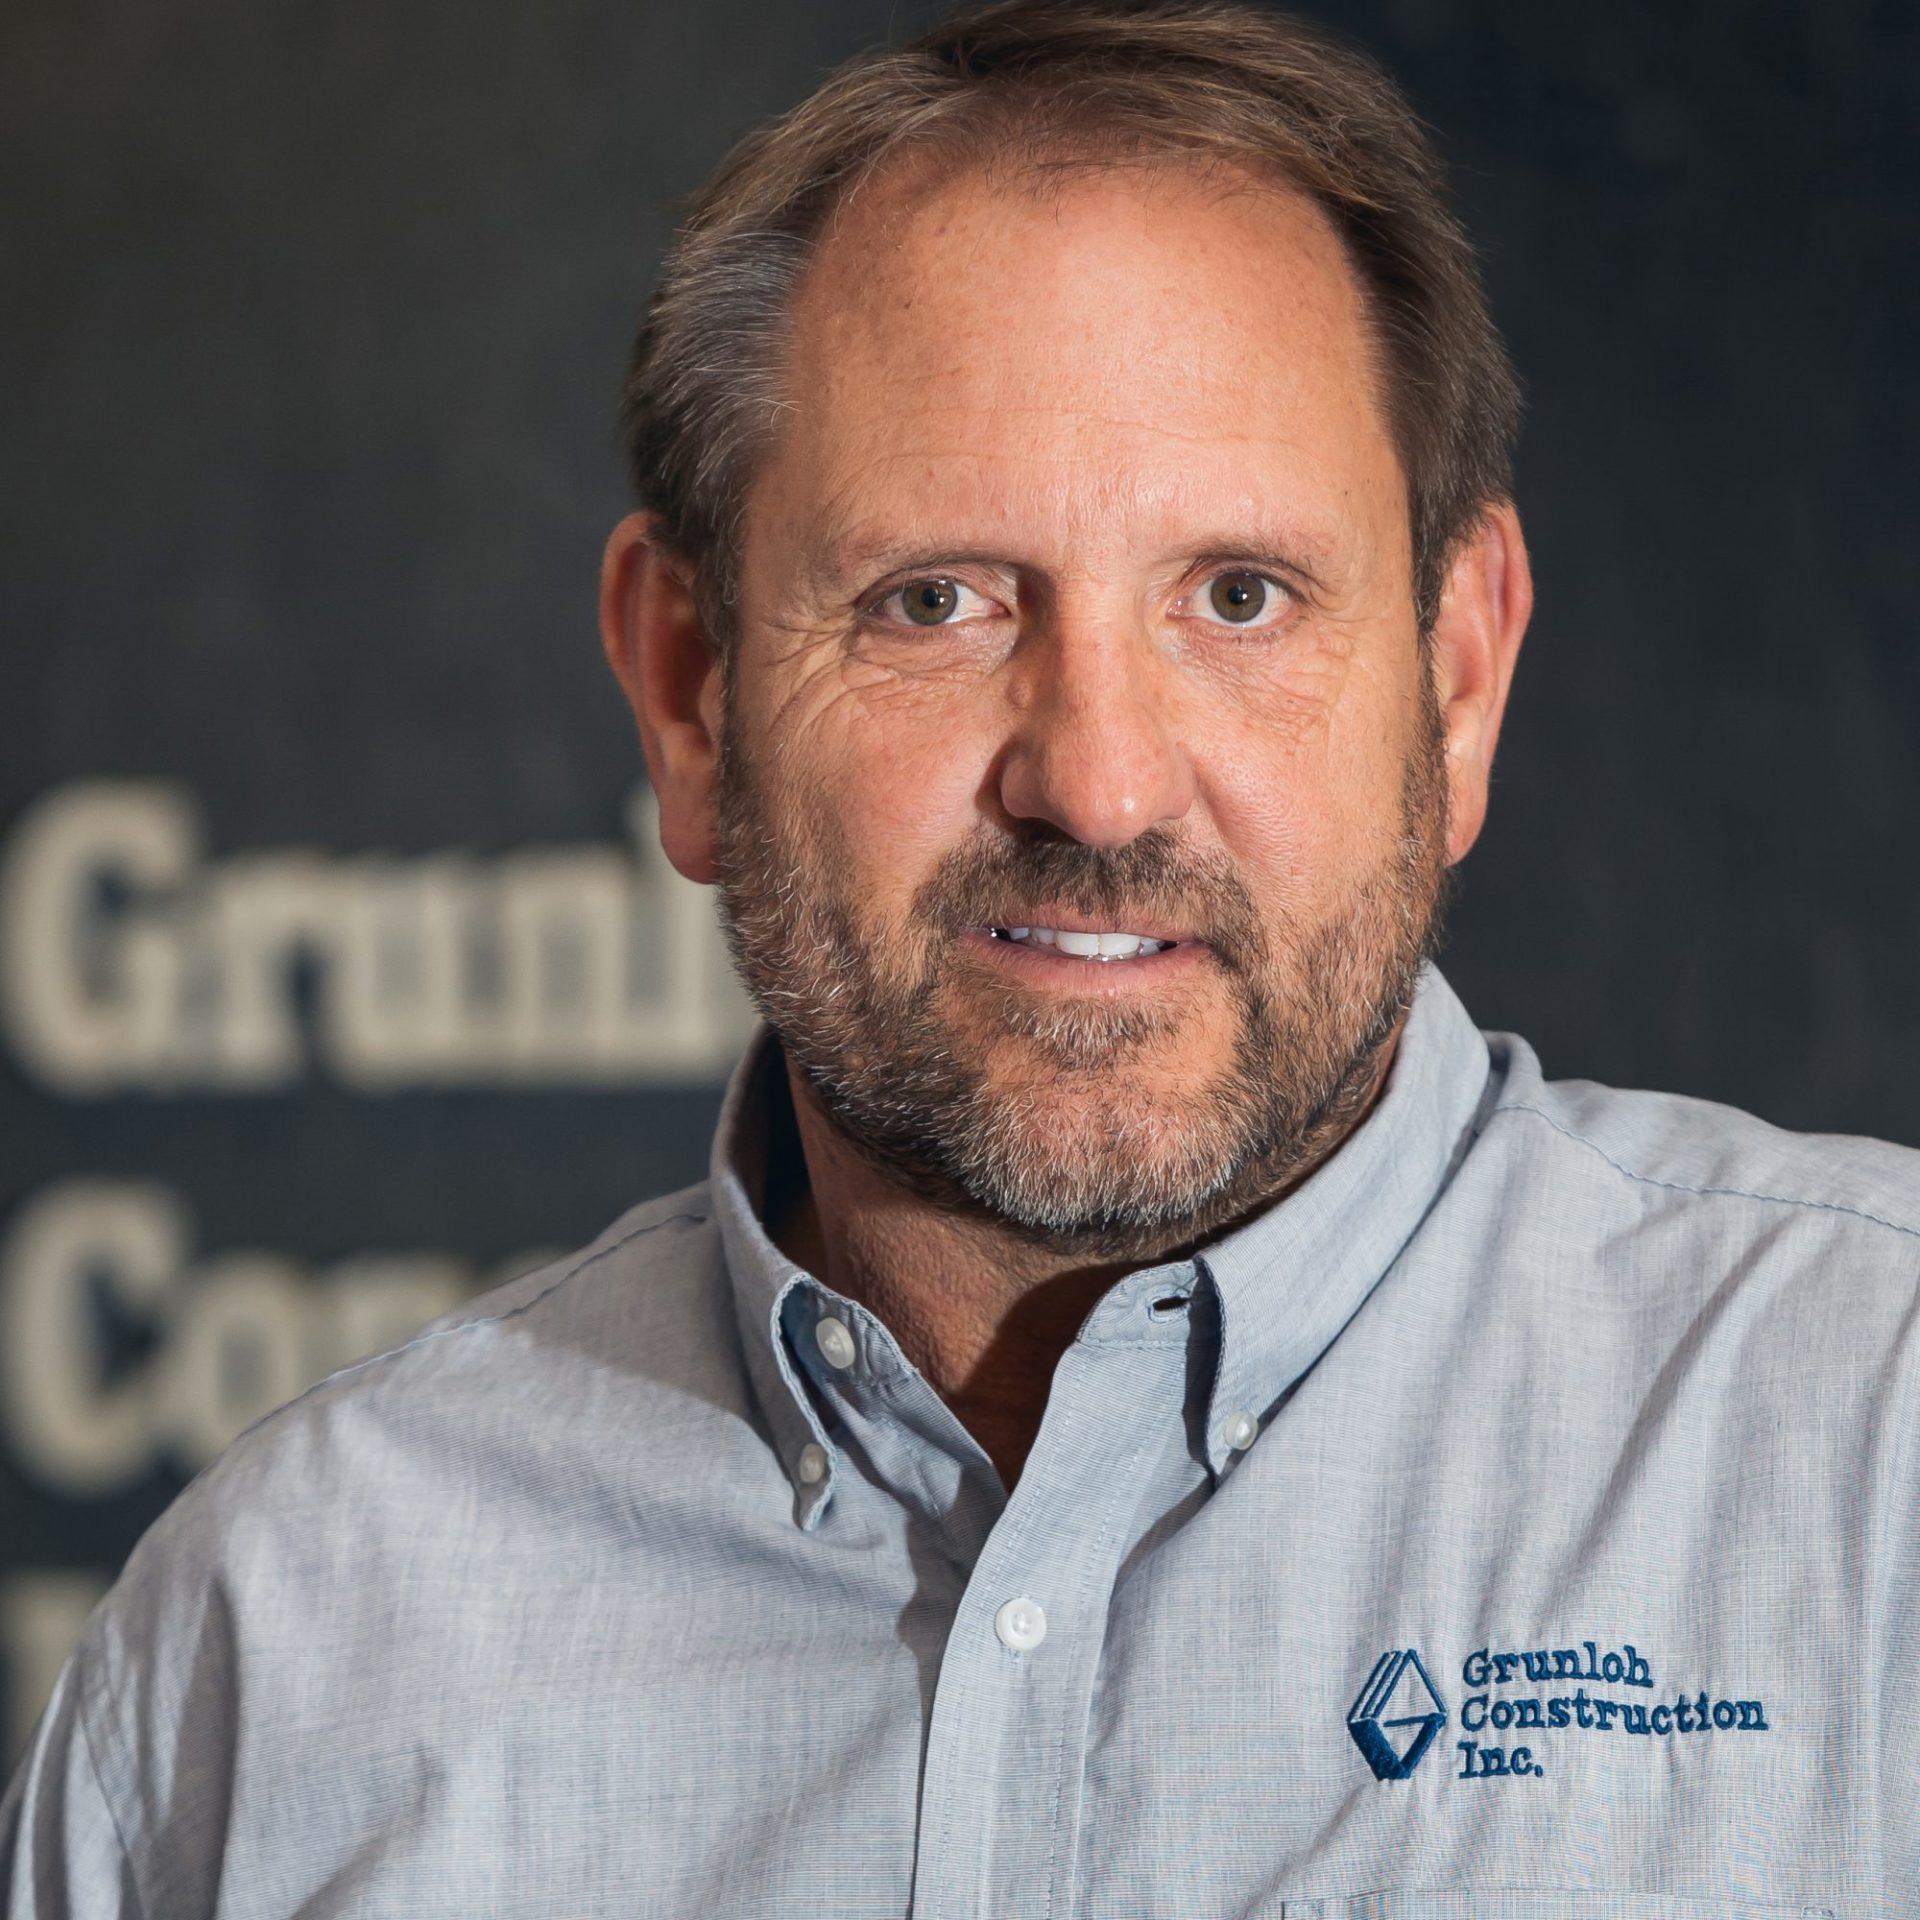 Tom Grunloh